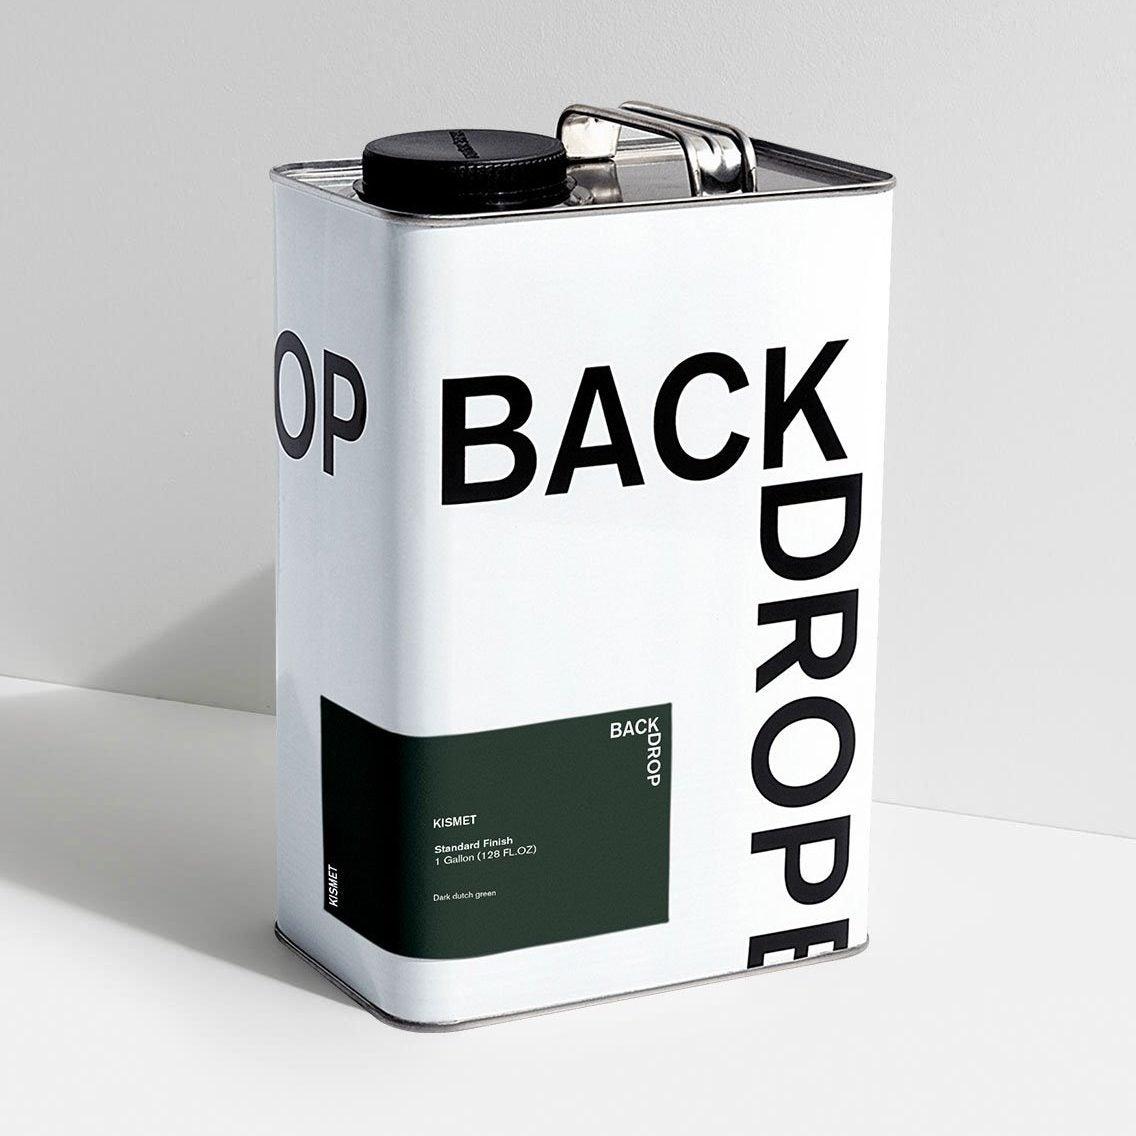 Backdrop_Kismet_Standard_PaintCan_slide3_1700x1700